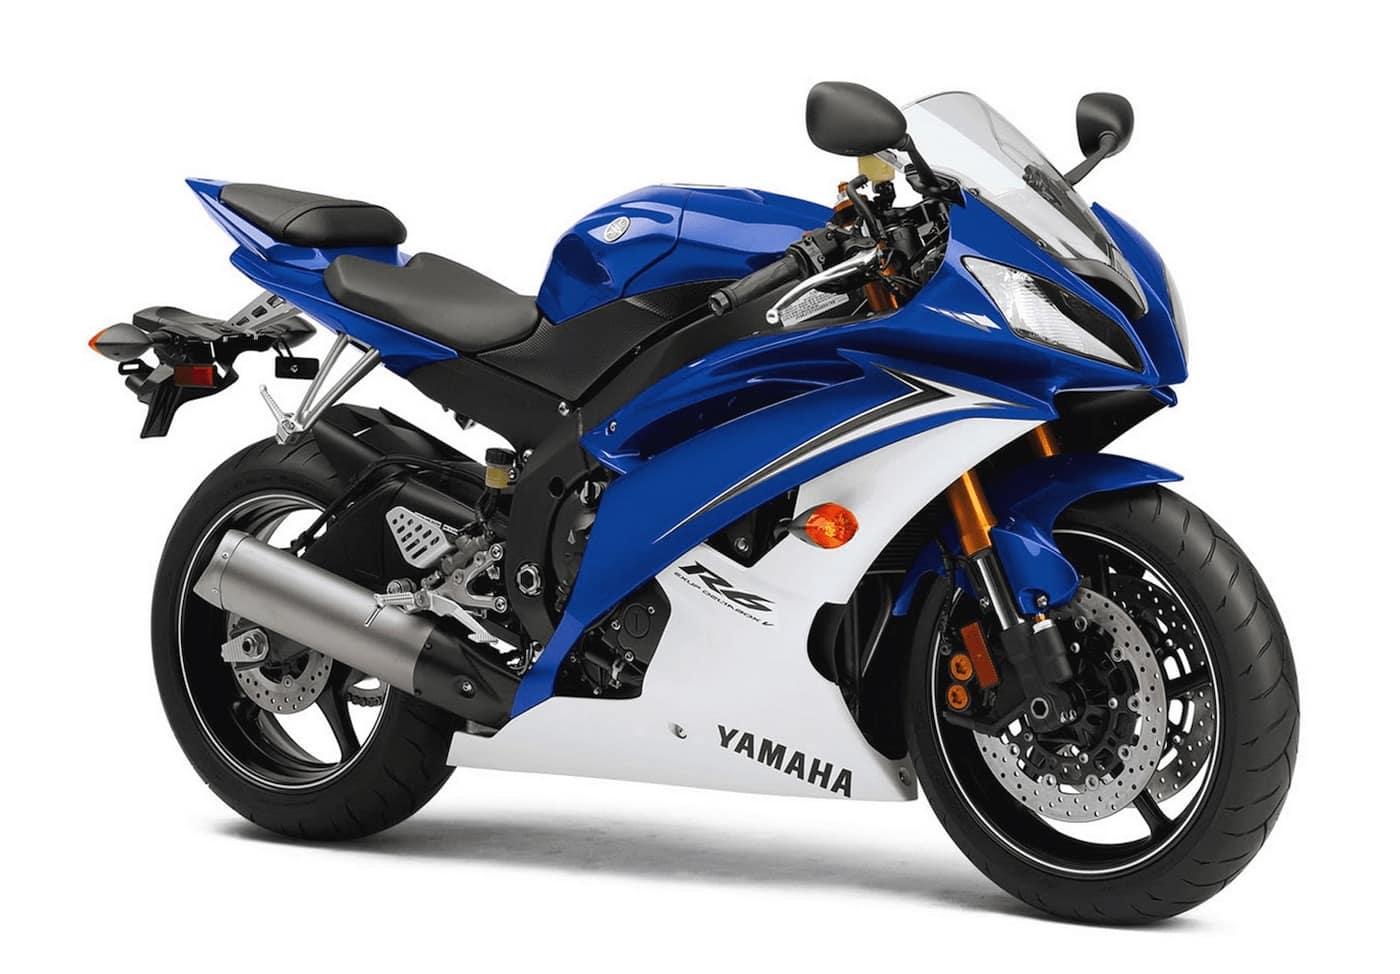 The 2010 Yamaha R6